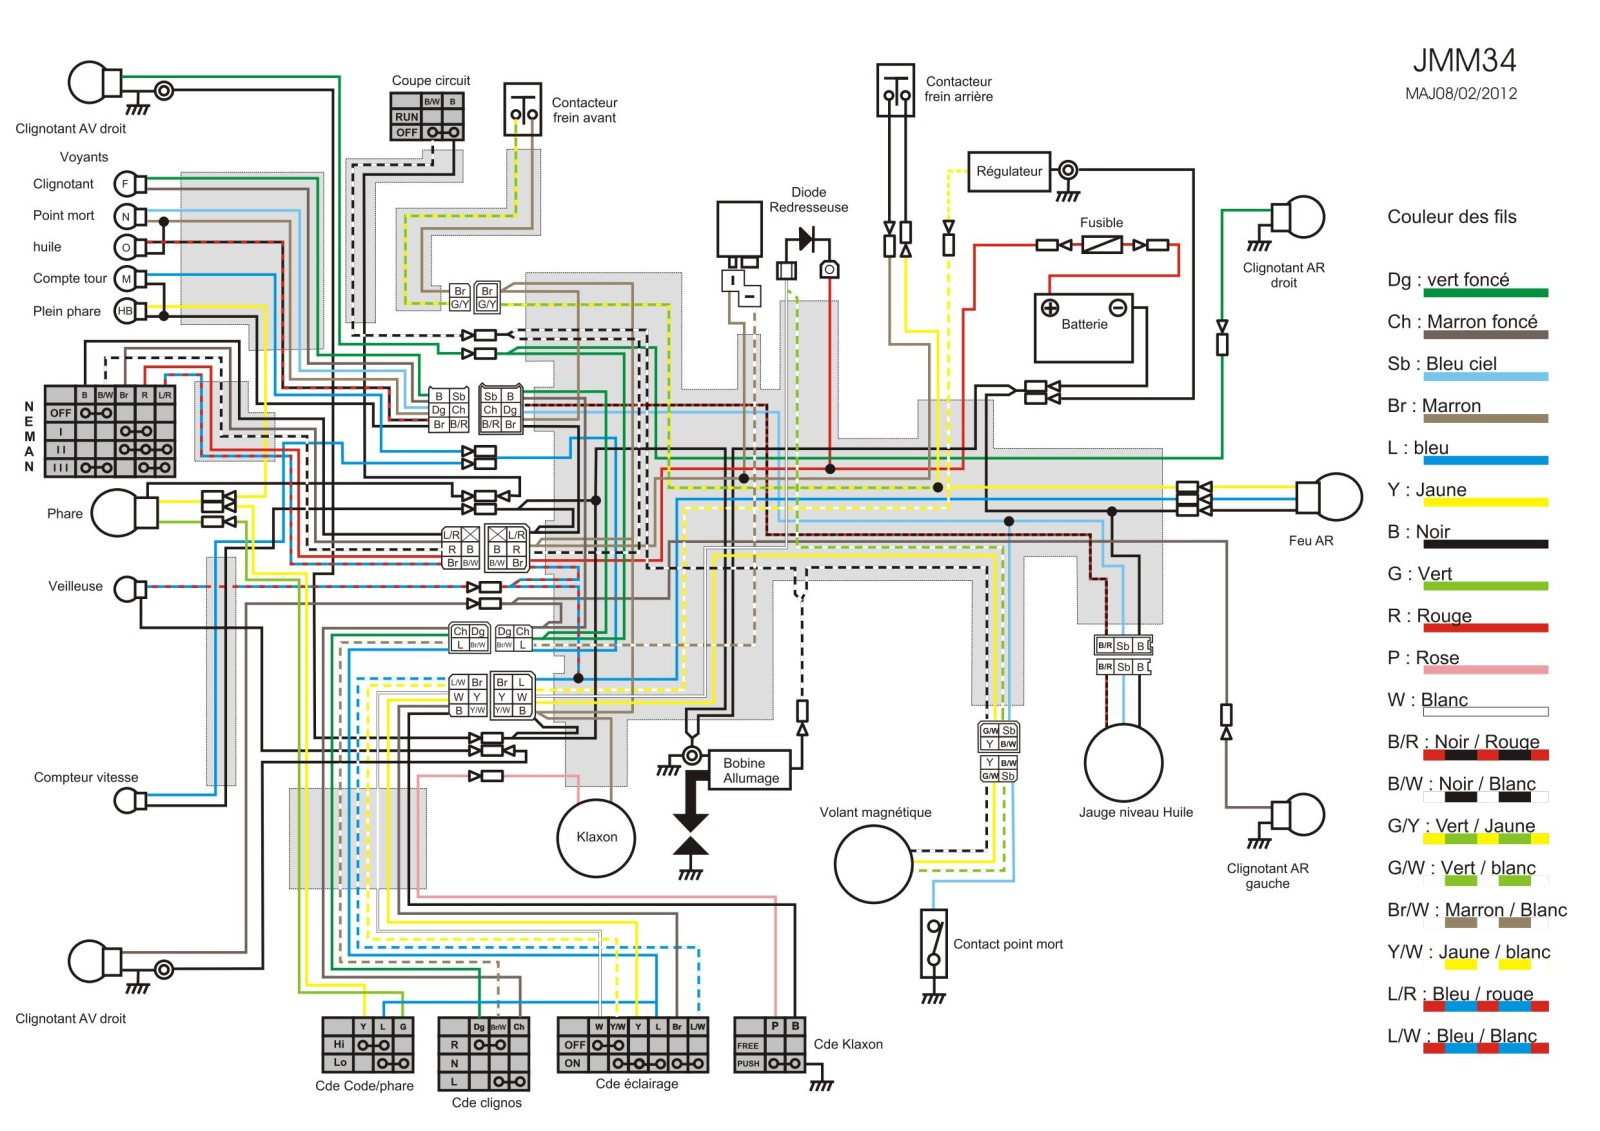 Bobine d'allumage schema electrique